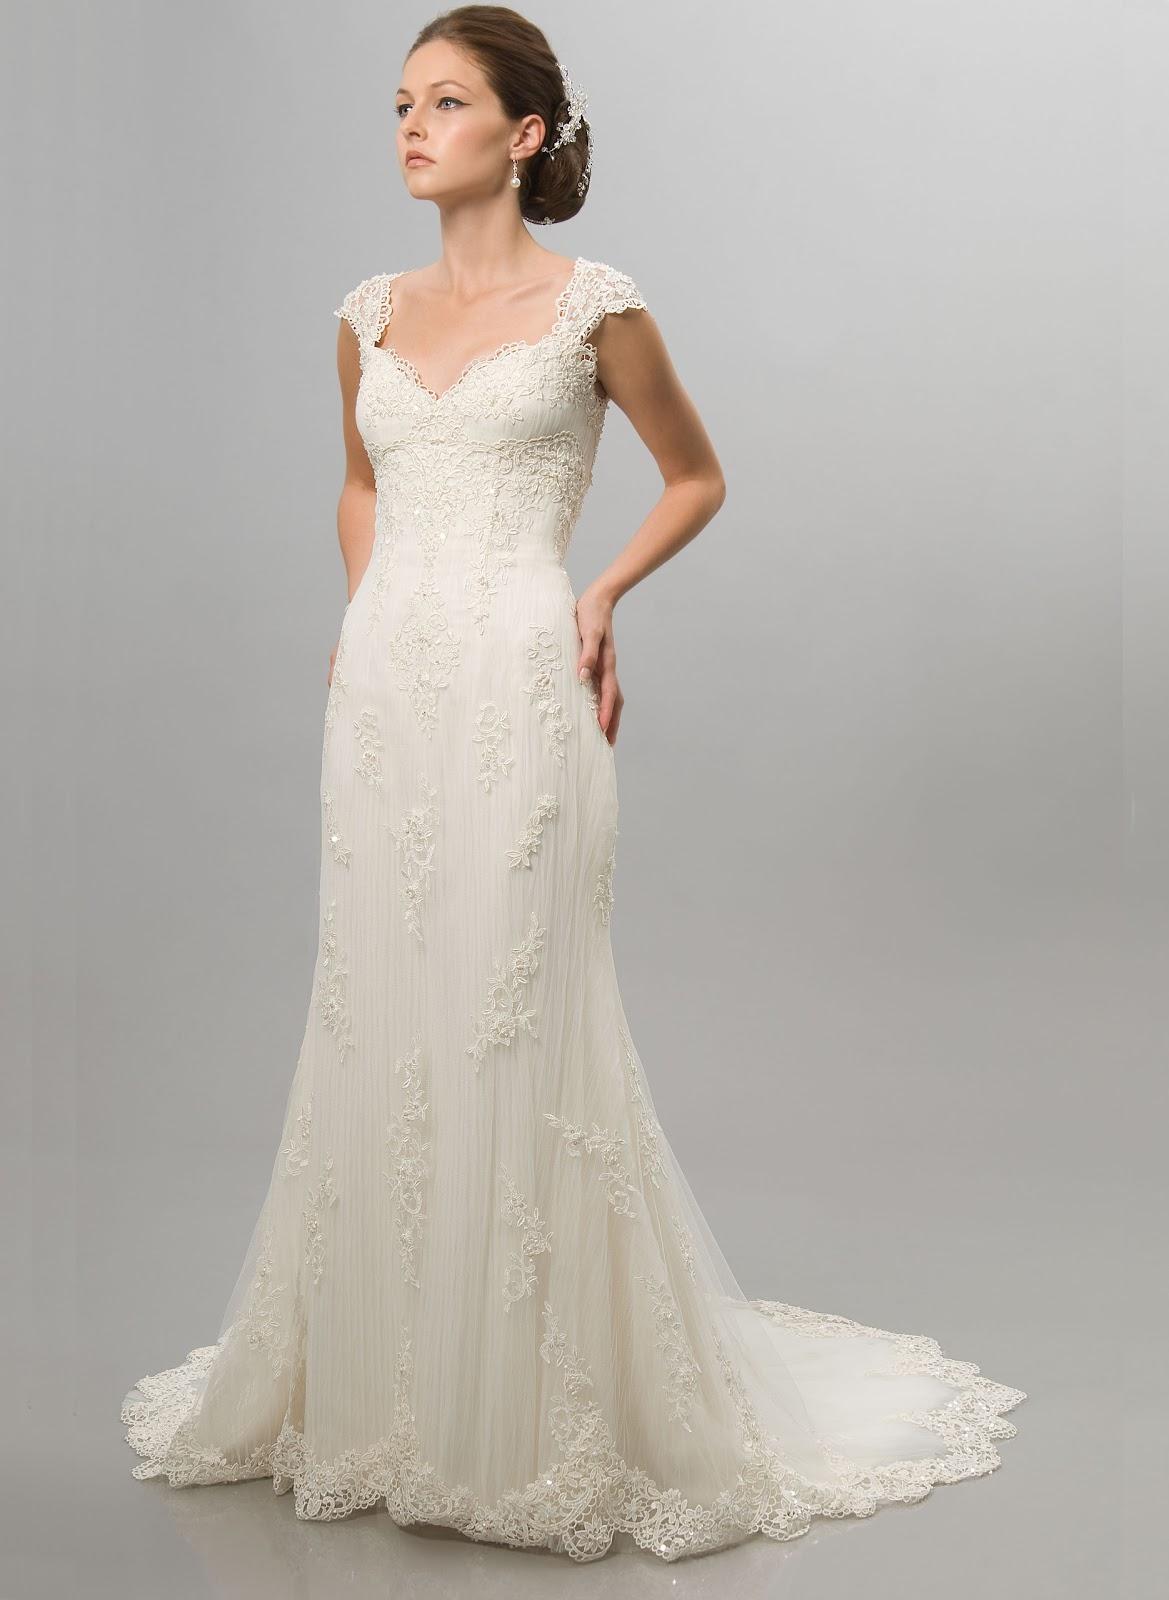 wedding dresses for brides over 60 photo - 1